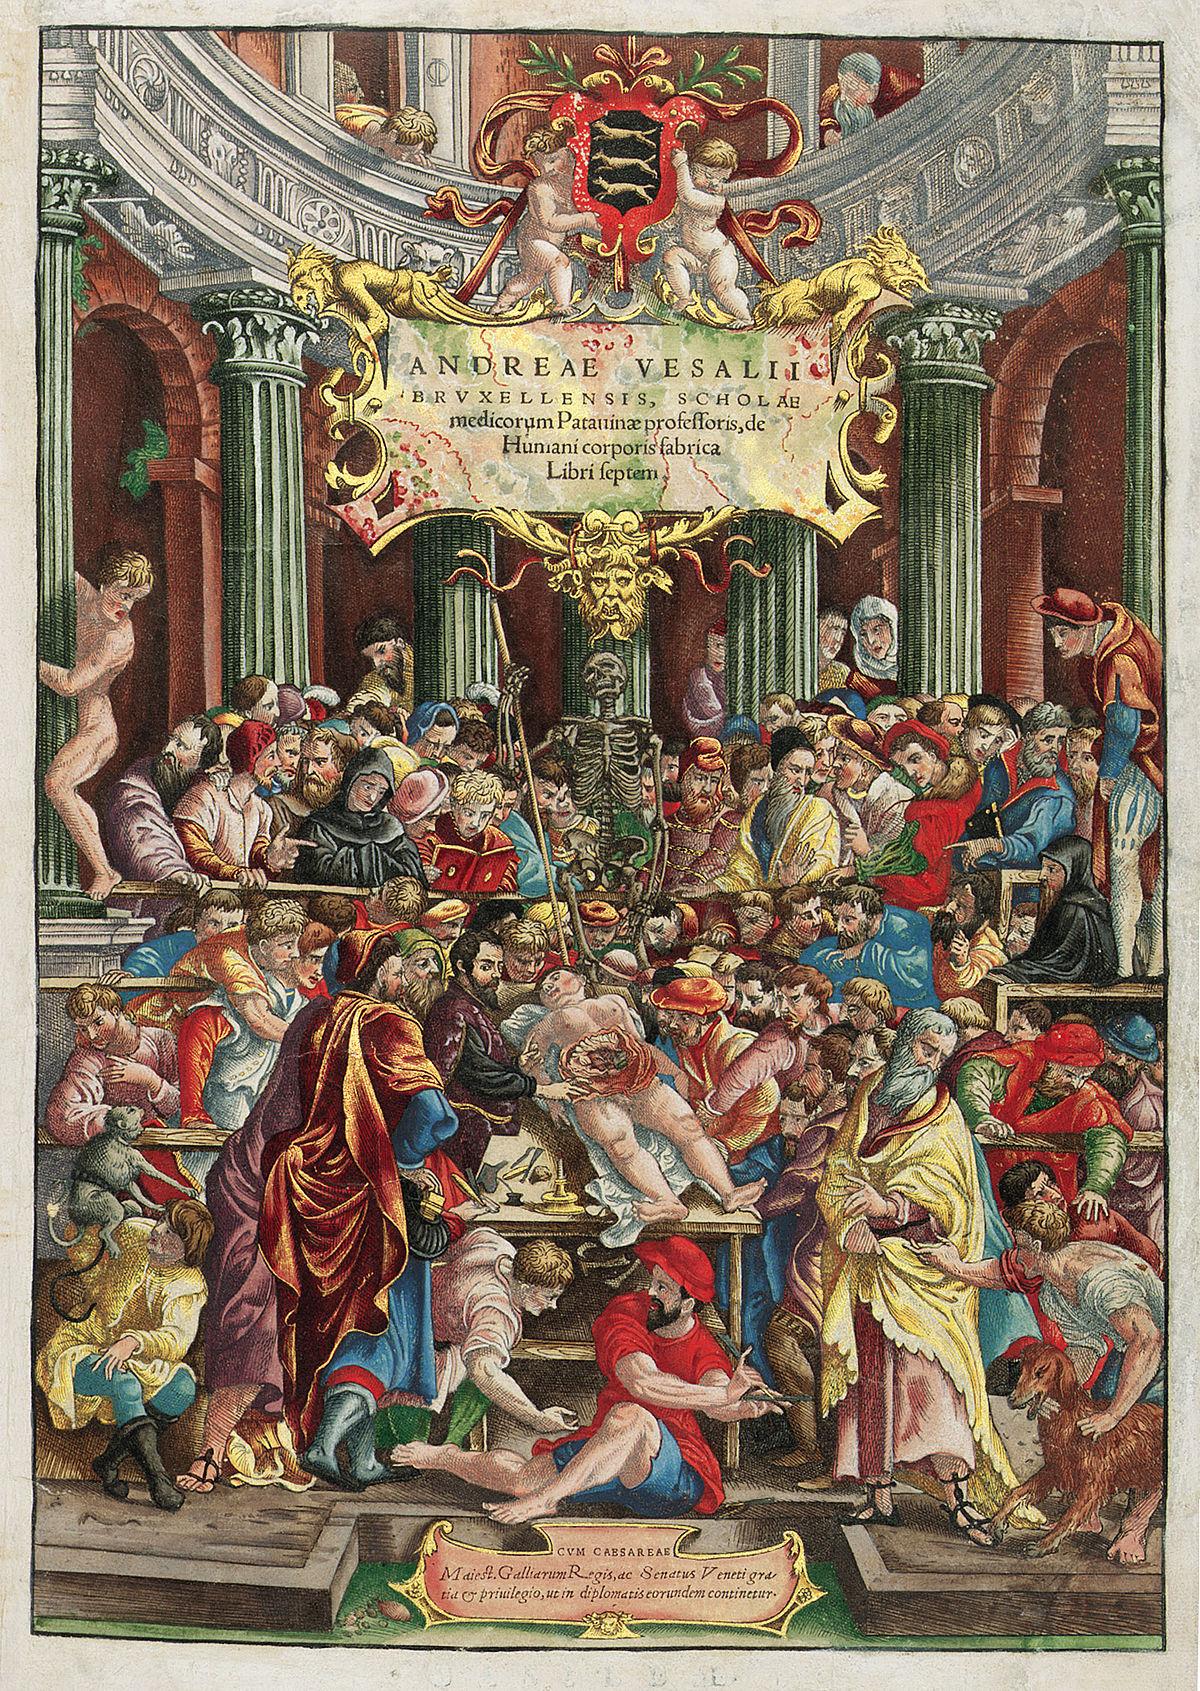 De humani corporis fabrica - Wikipedia, la enciclopedia libre